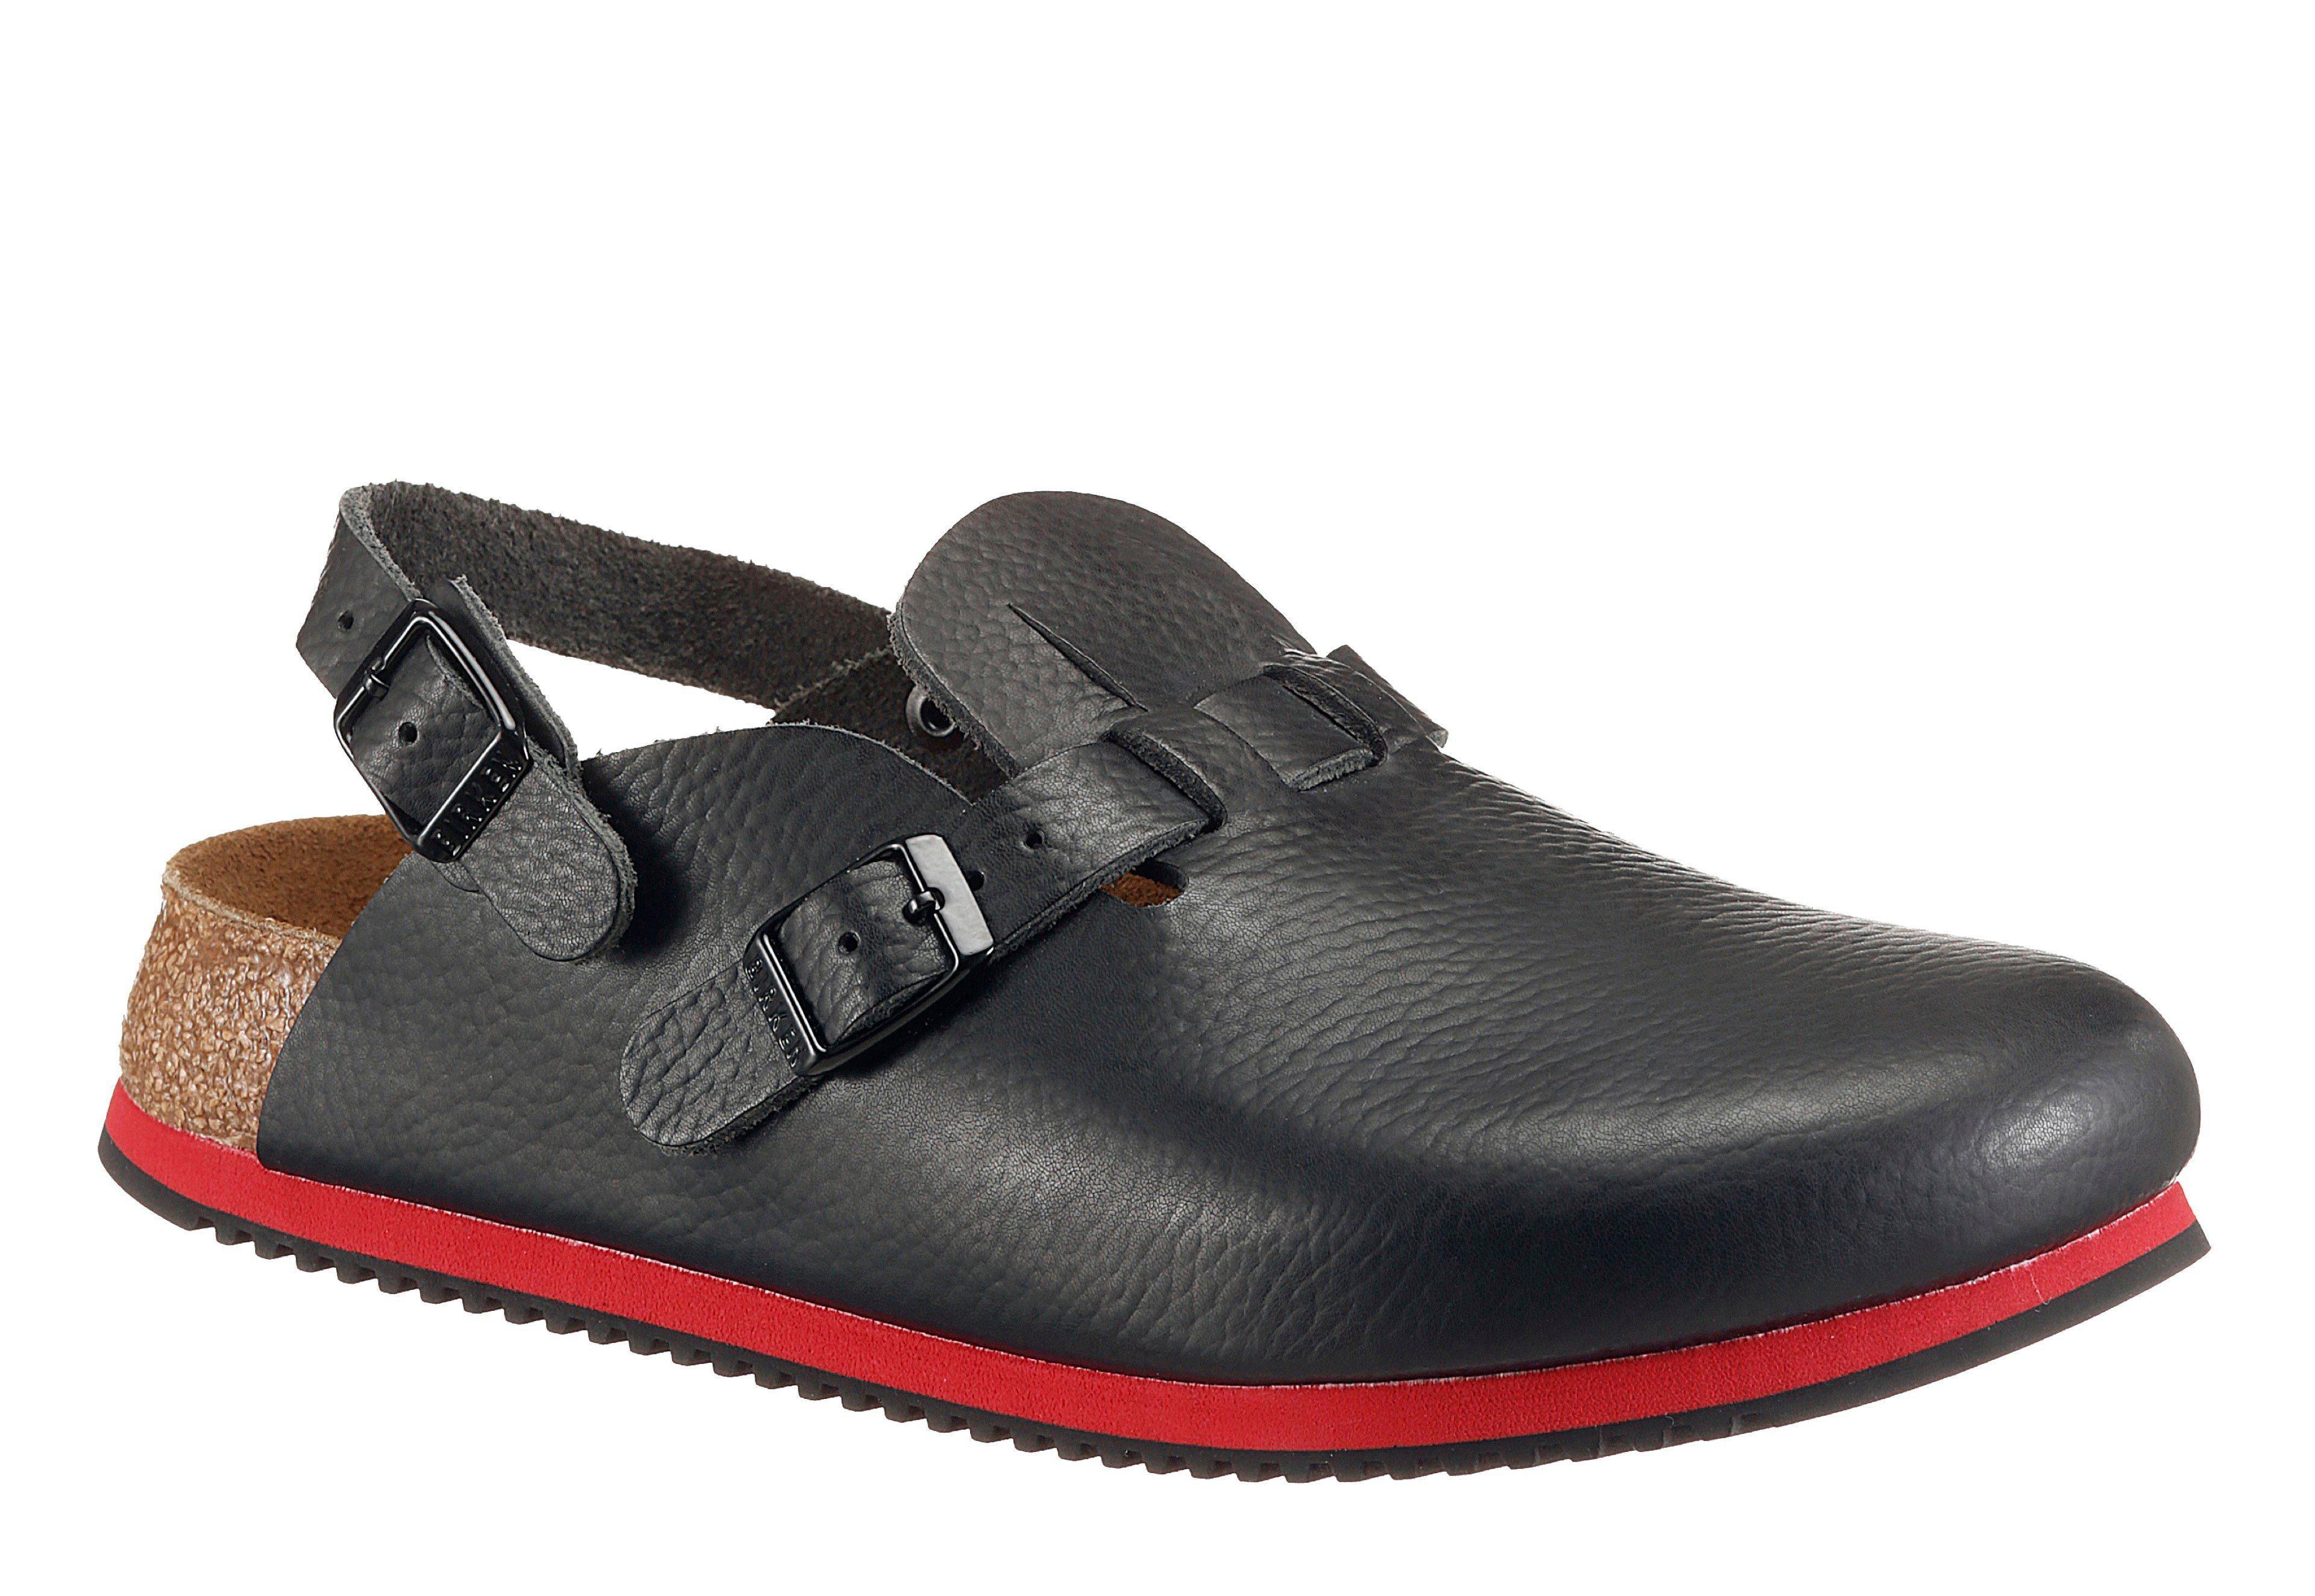 BIRKENSTOCK Clog rot / schwarz GUx6LBc